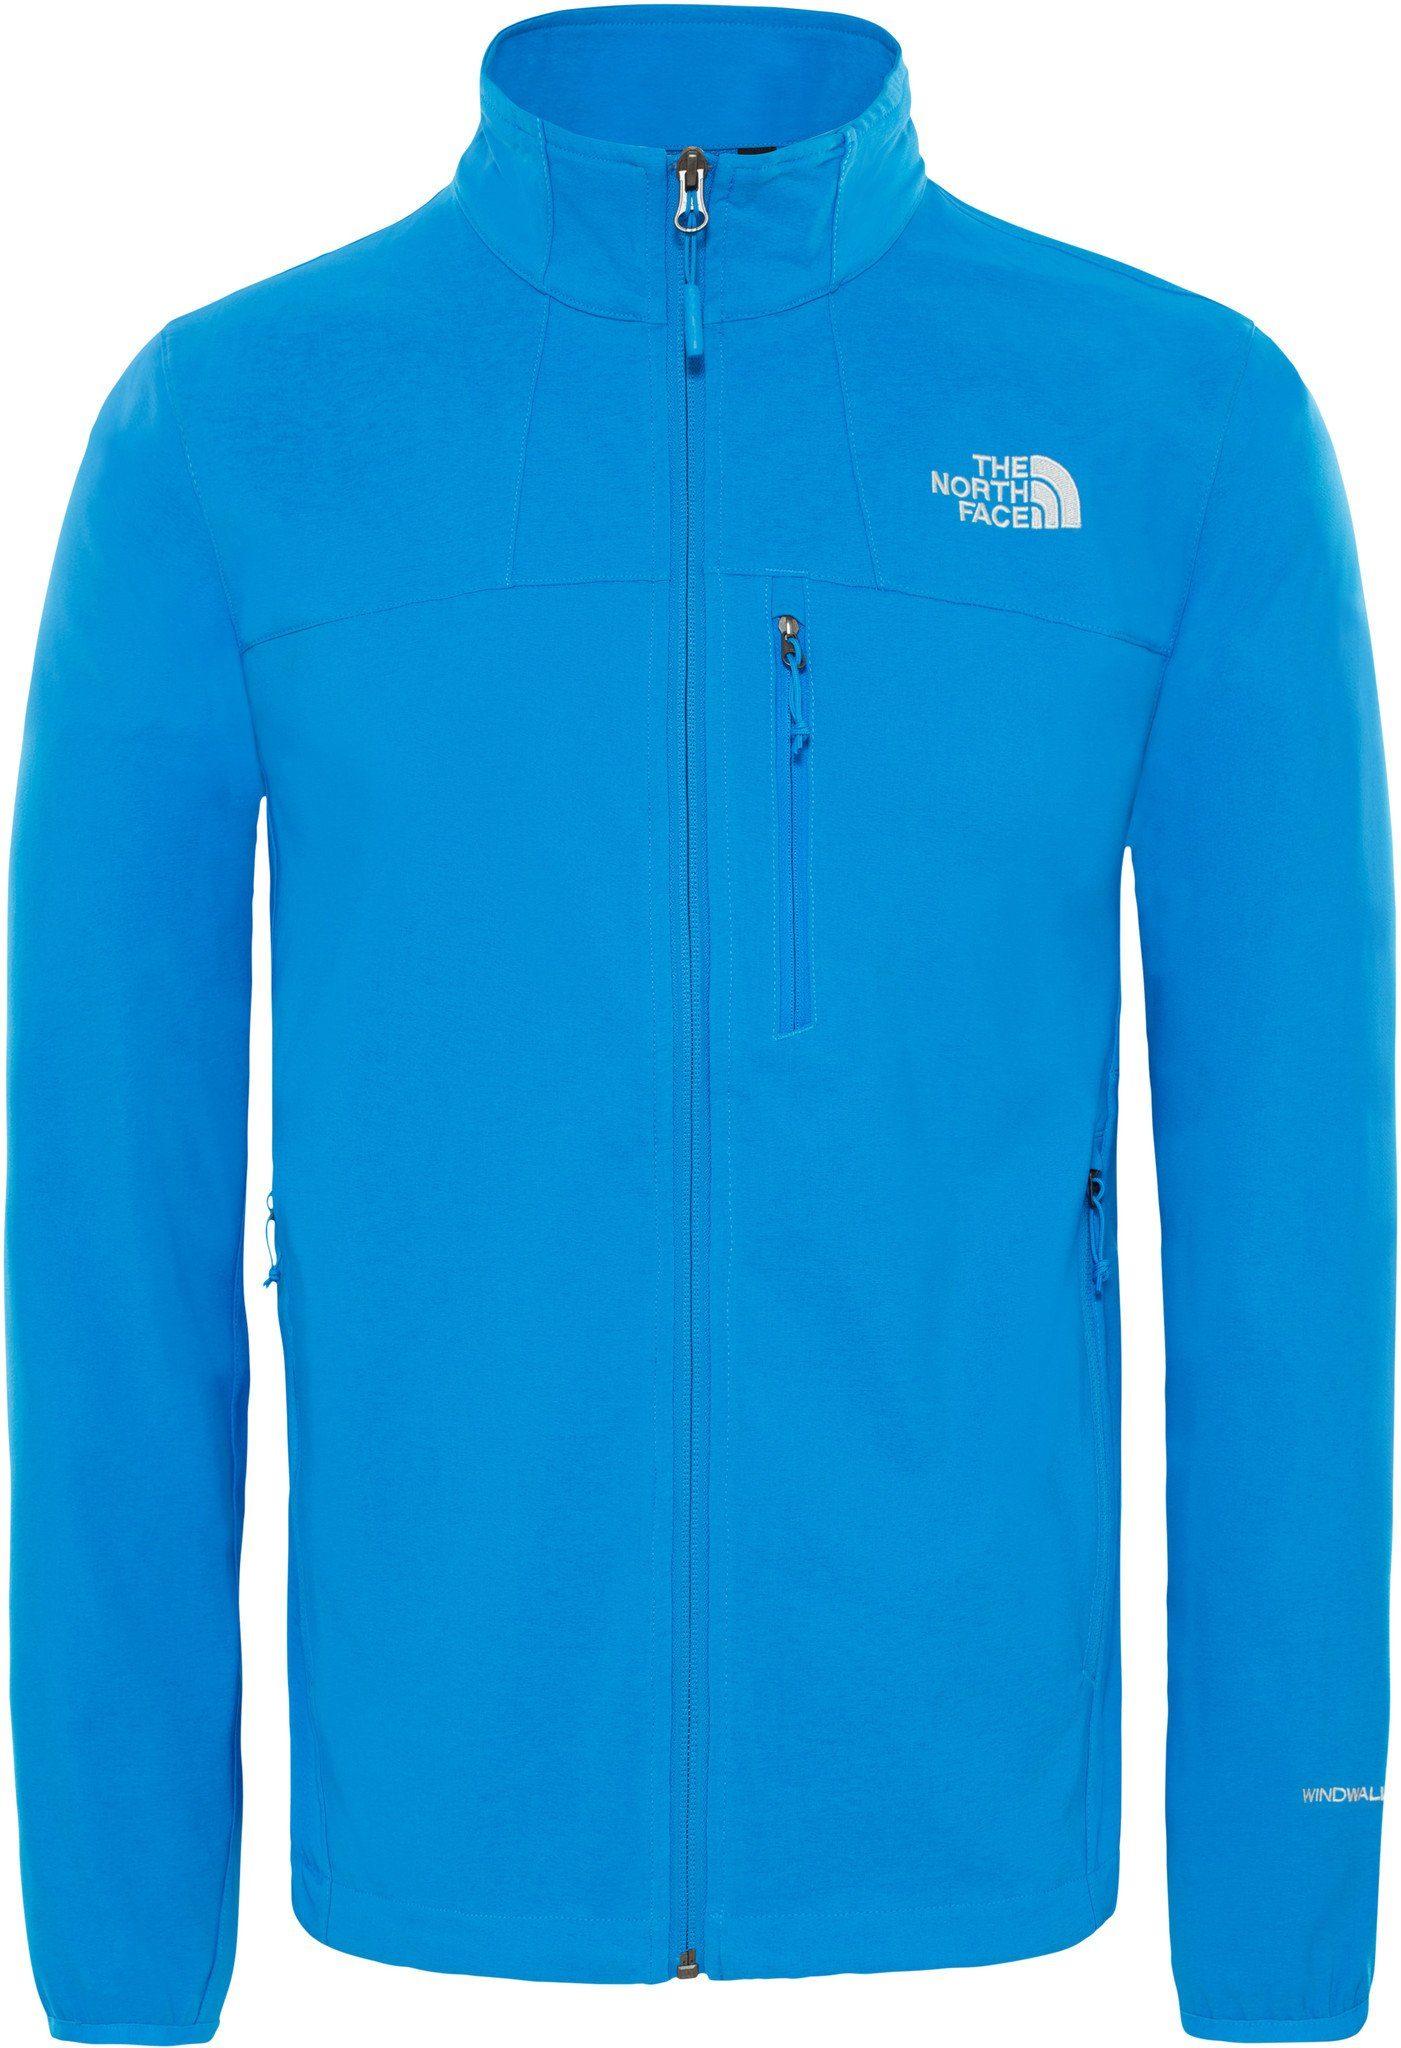 THE NORTH FACE Nimble Outdoorjacke für Herren Blau